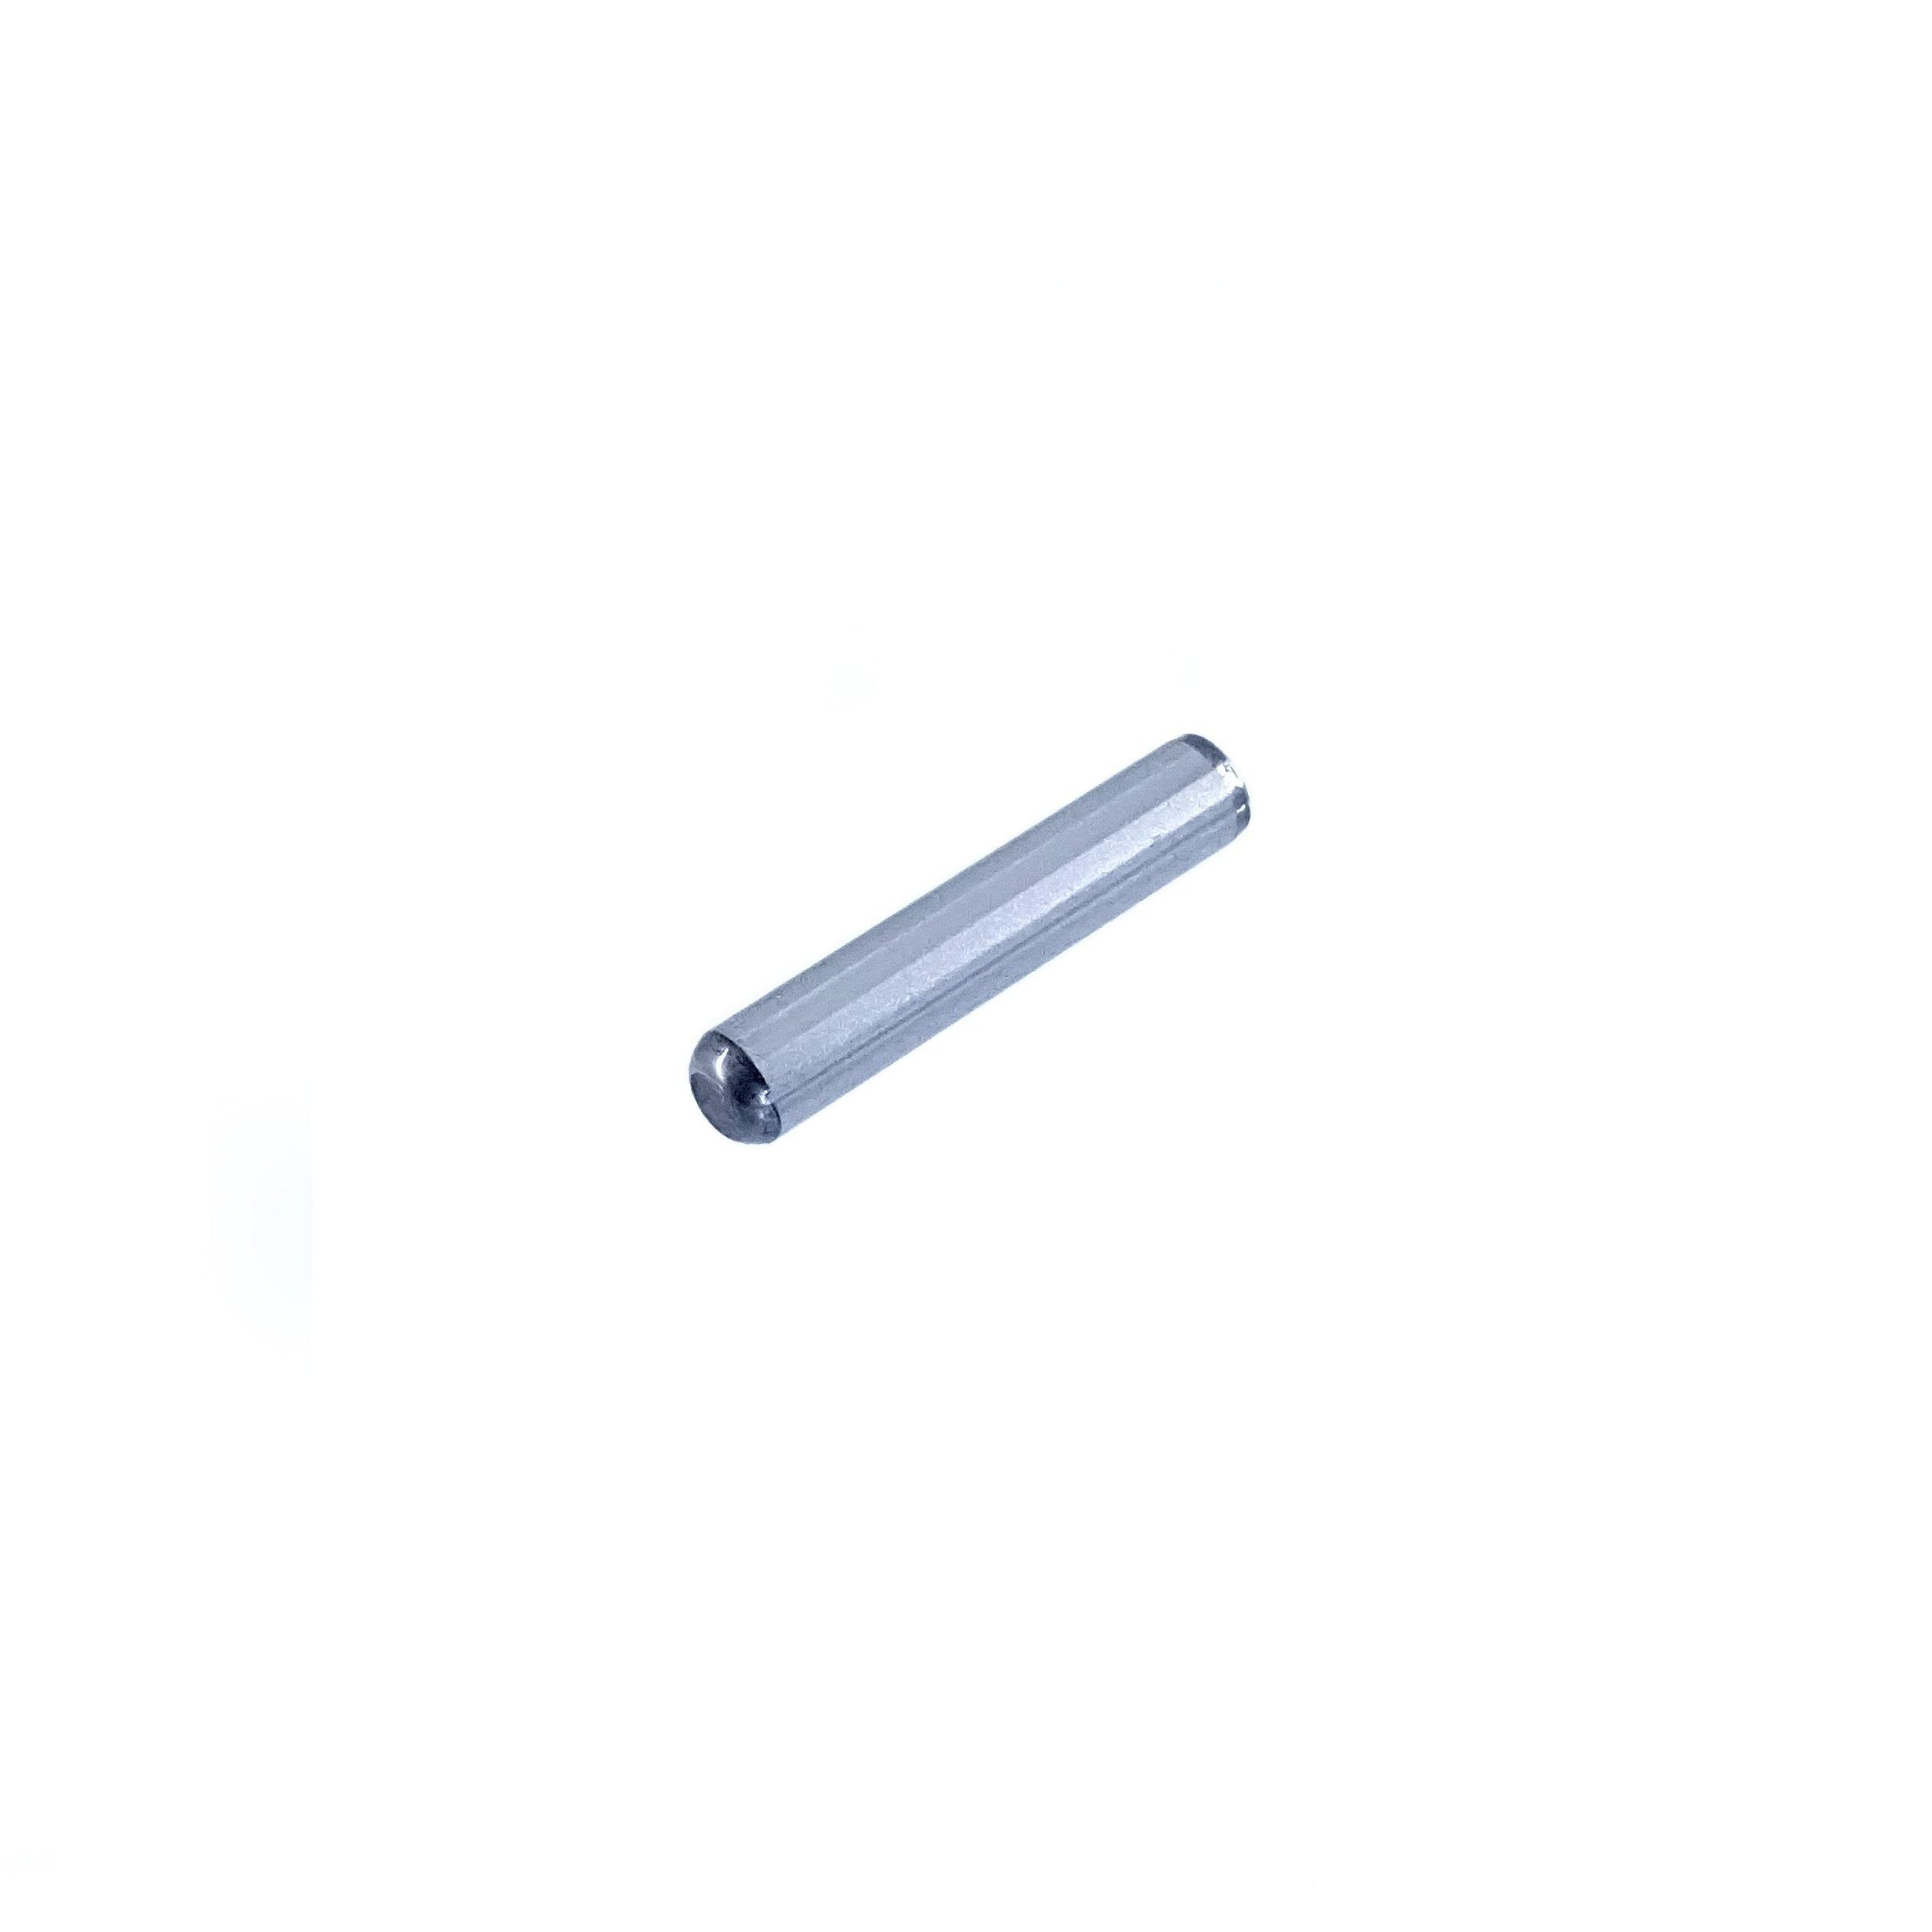 3/16 x 1'' Dowel Pins, Alloy Steel, Pack of 13